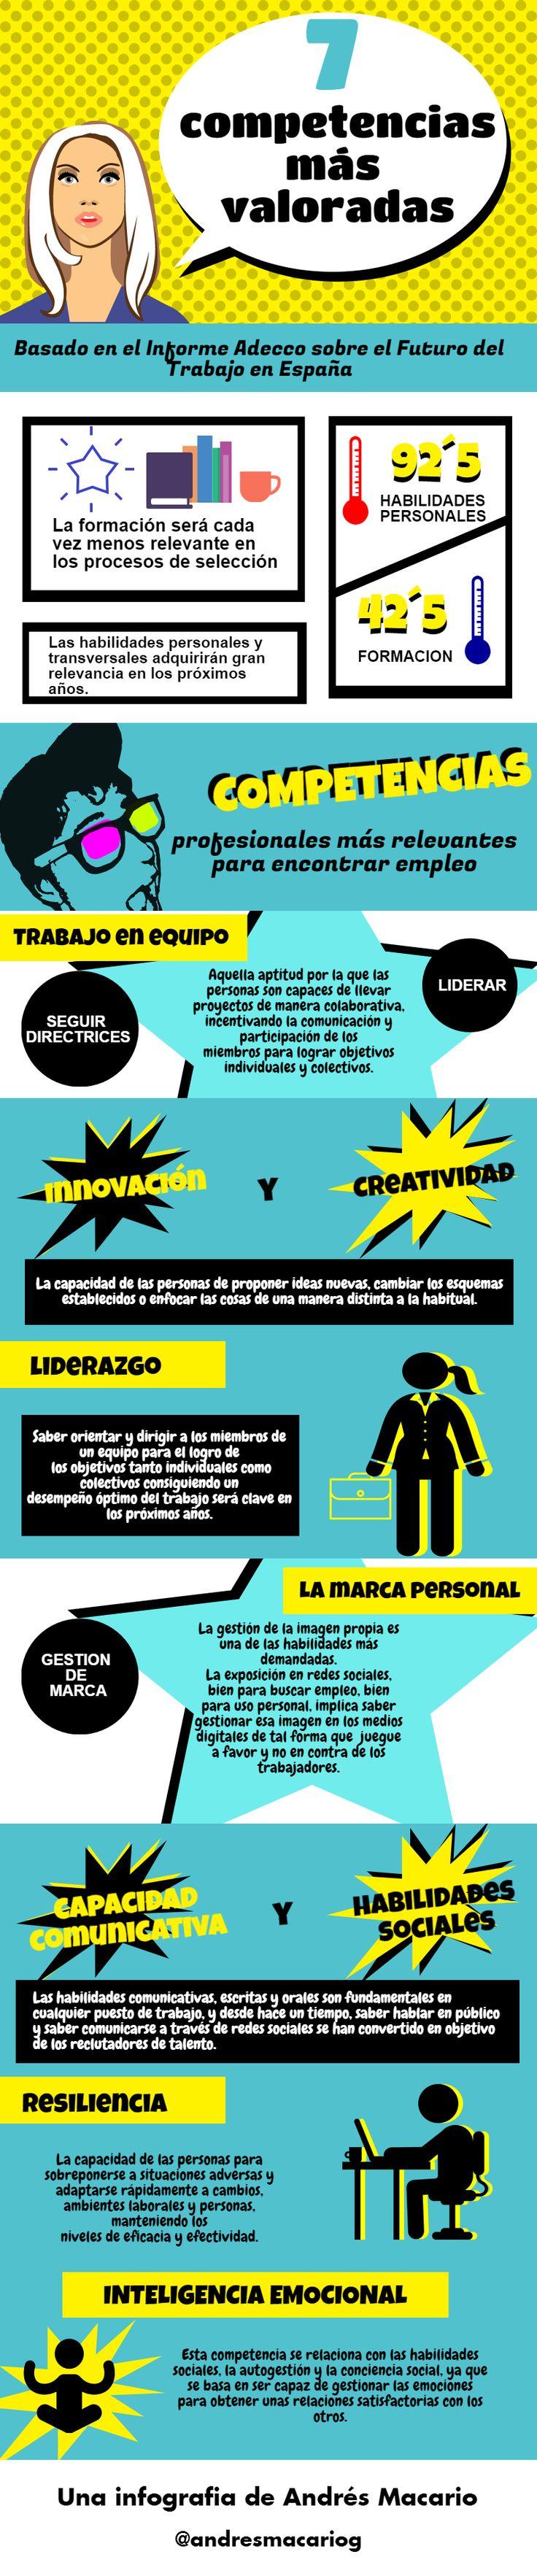 7 #competencias mas valoradas #RRHH #Infografia Andres Macario #trabajo #empleo